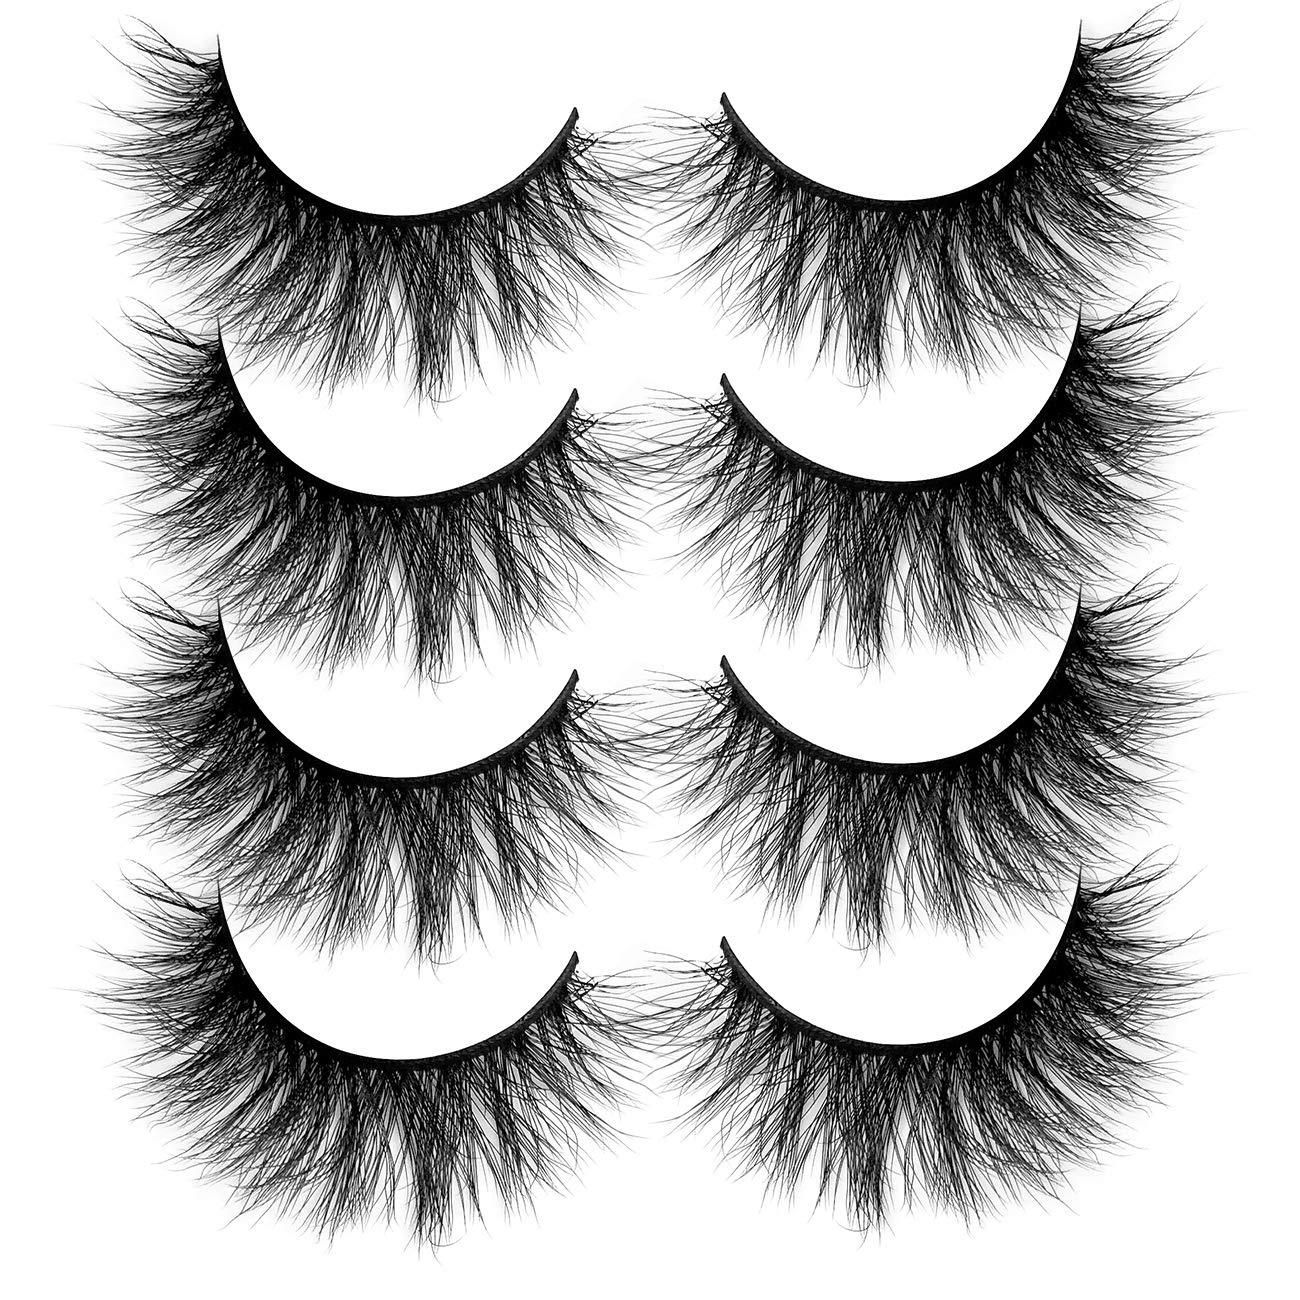 ALICROWN 3D Faux Mink Eyelashes,Fluffy False Lashes Volume Natural Cross Soft Handmade Wispy Eye MakeupROWN